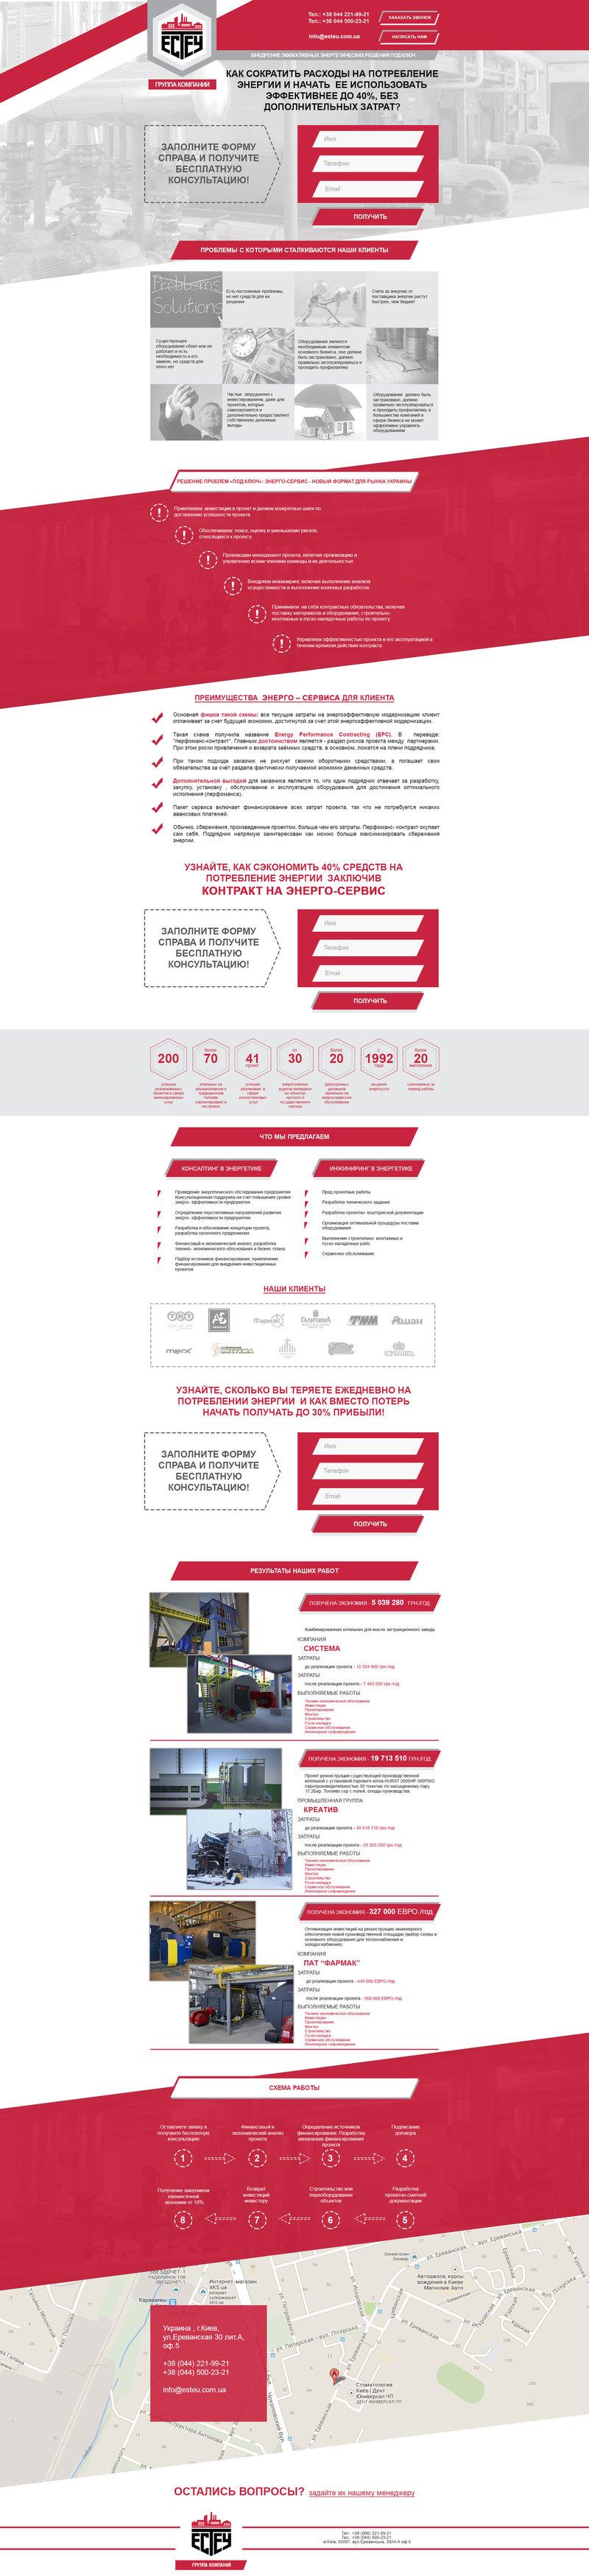 Дизайн лендинга ЕСТУ – работа в портфолио фрилансера